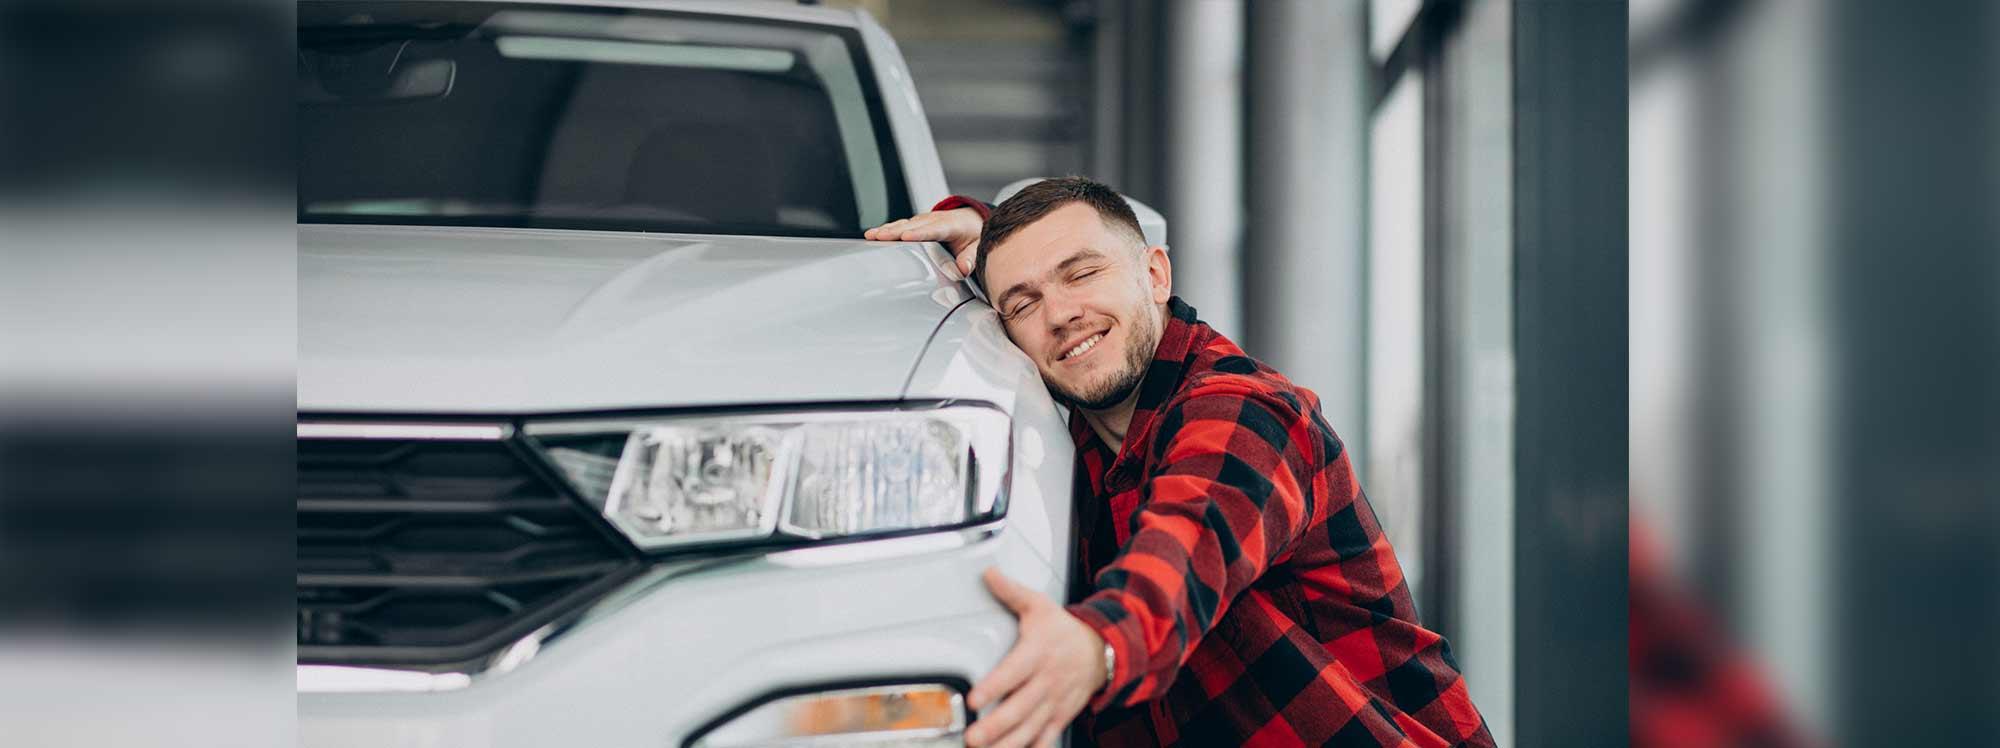 ¿Estás listo para adquirir tu primer auto?